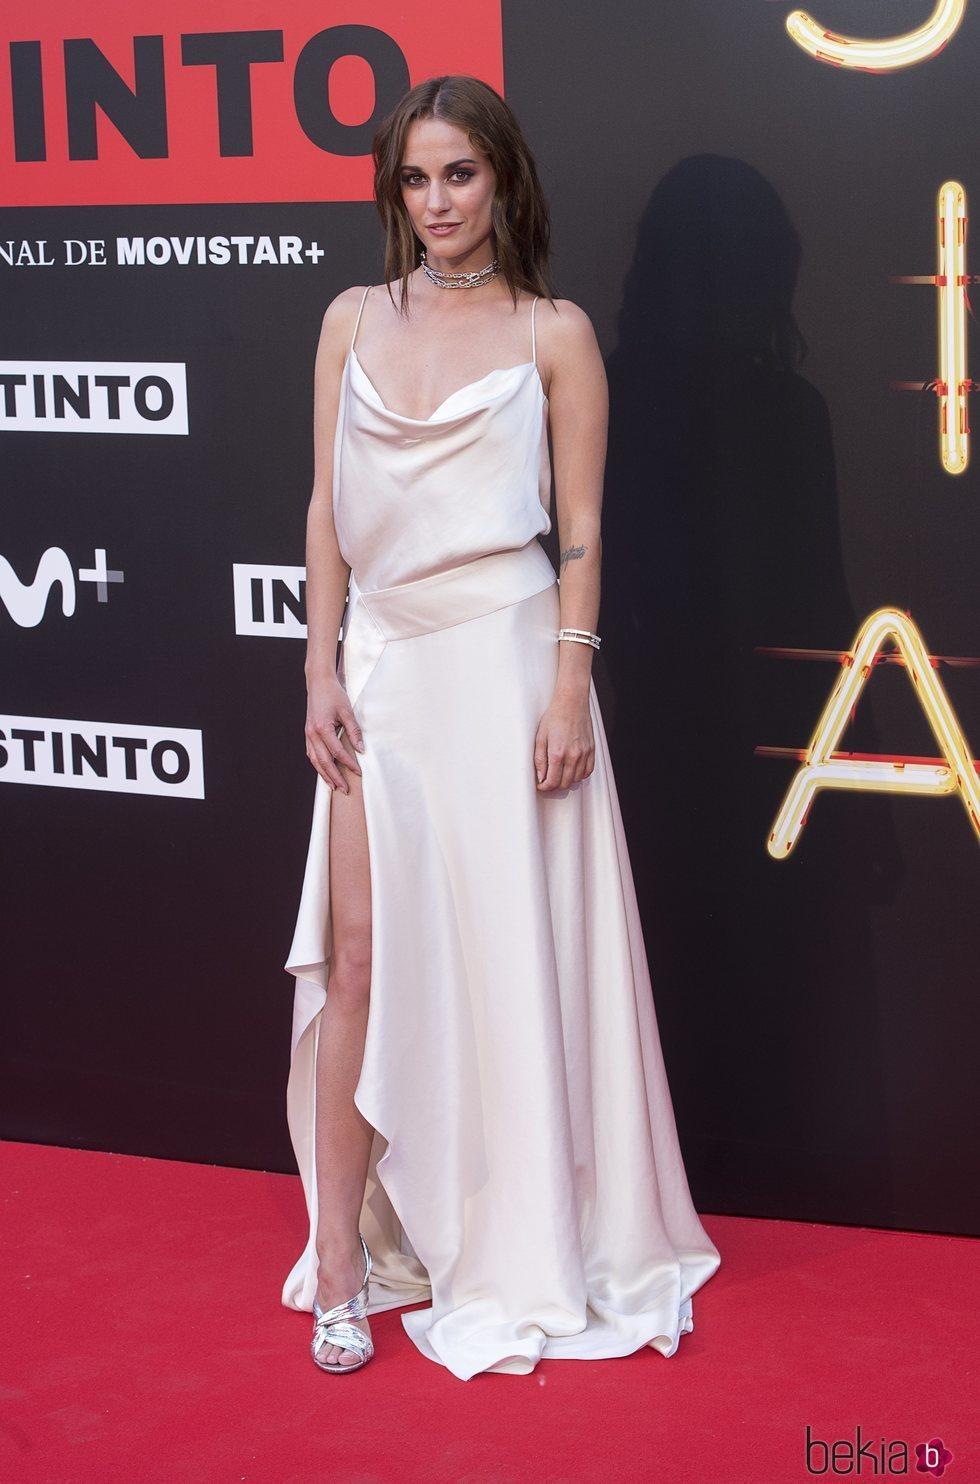 Silvia Alonso en la premiere de la serie 'Instinto'